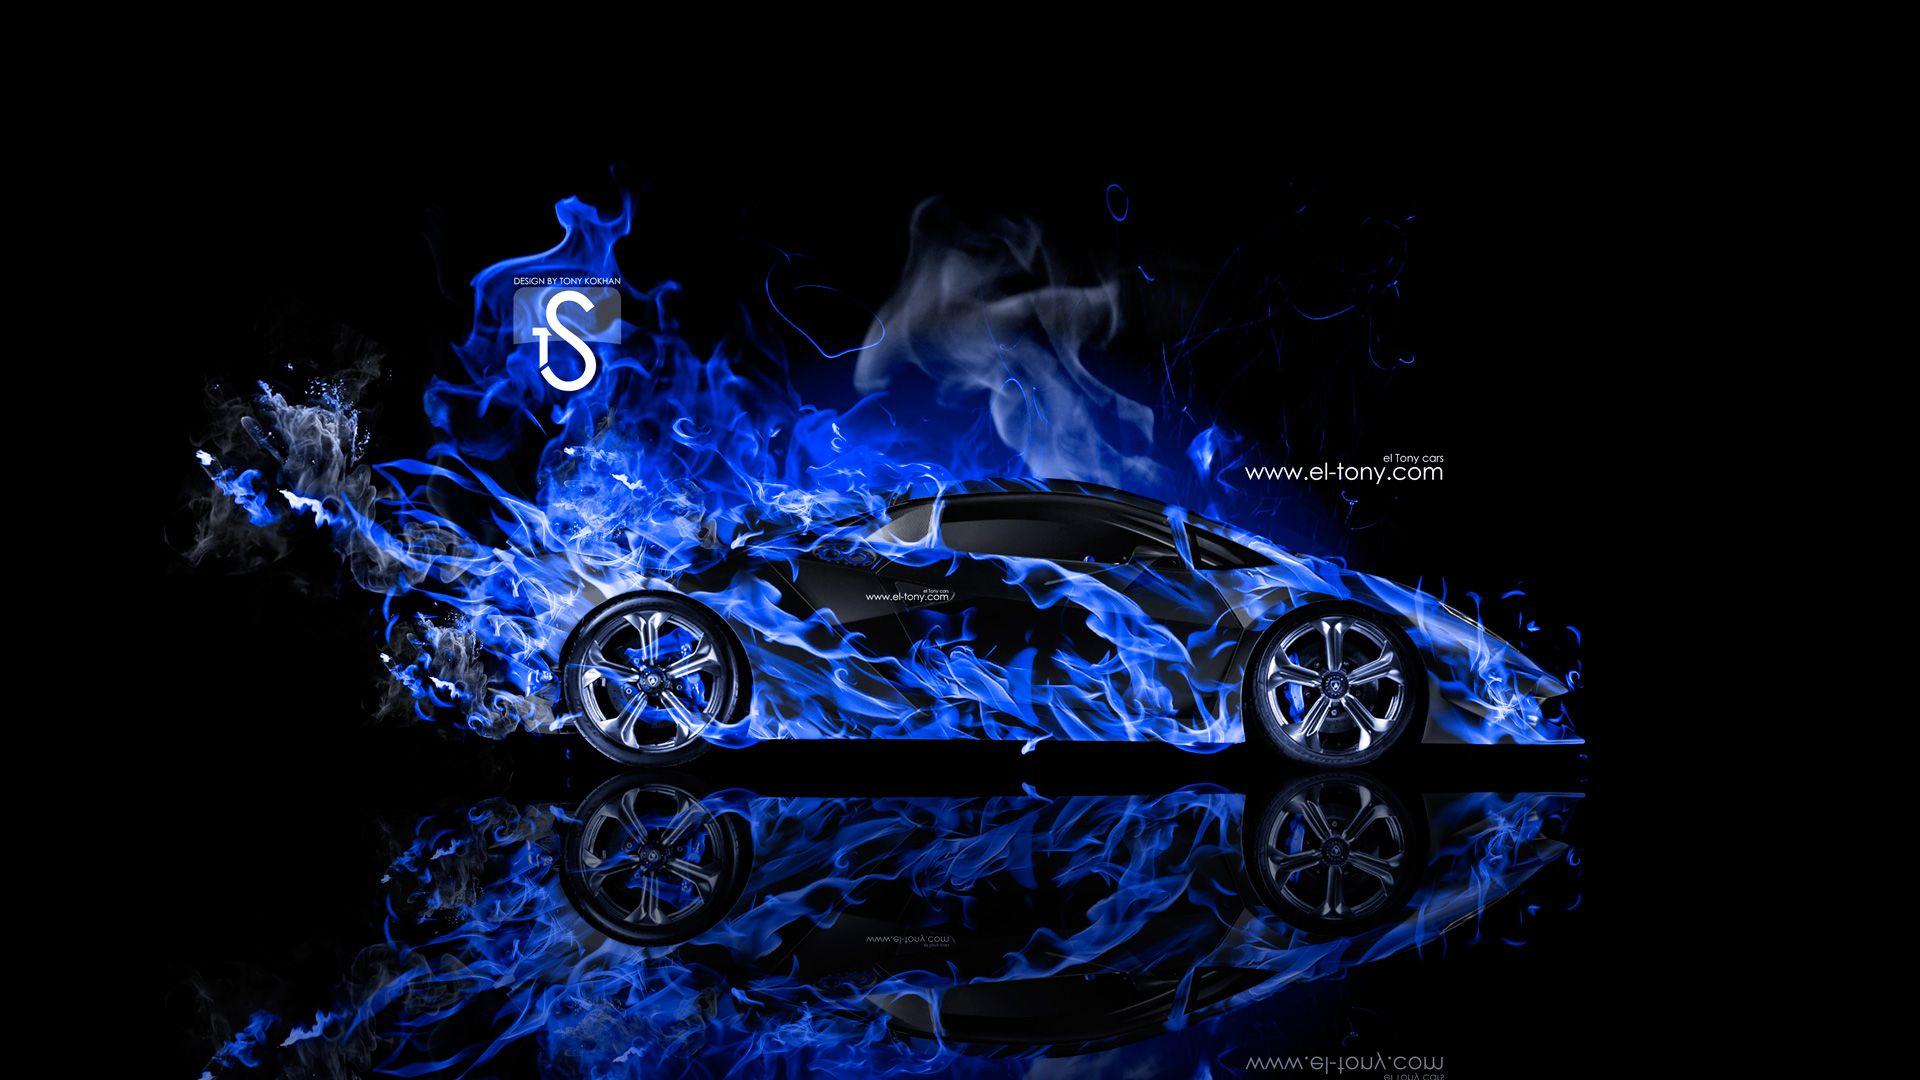 Black And Blue Lamborghini Wallpaper 1 Free Hd Wallpaper Blue Lamborghini Blue Wallpaper Iphone Car Wallpapers